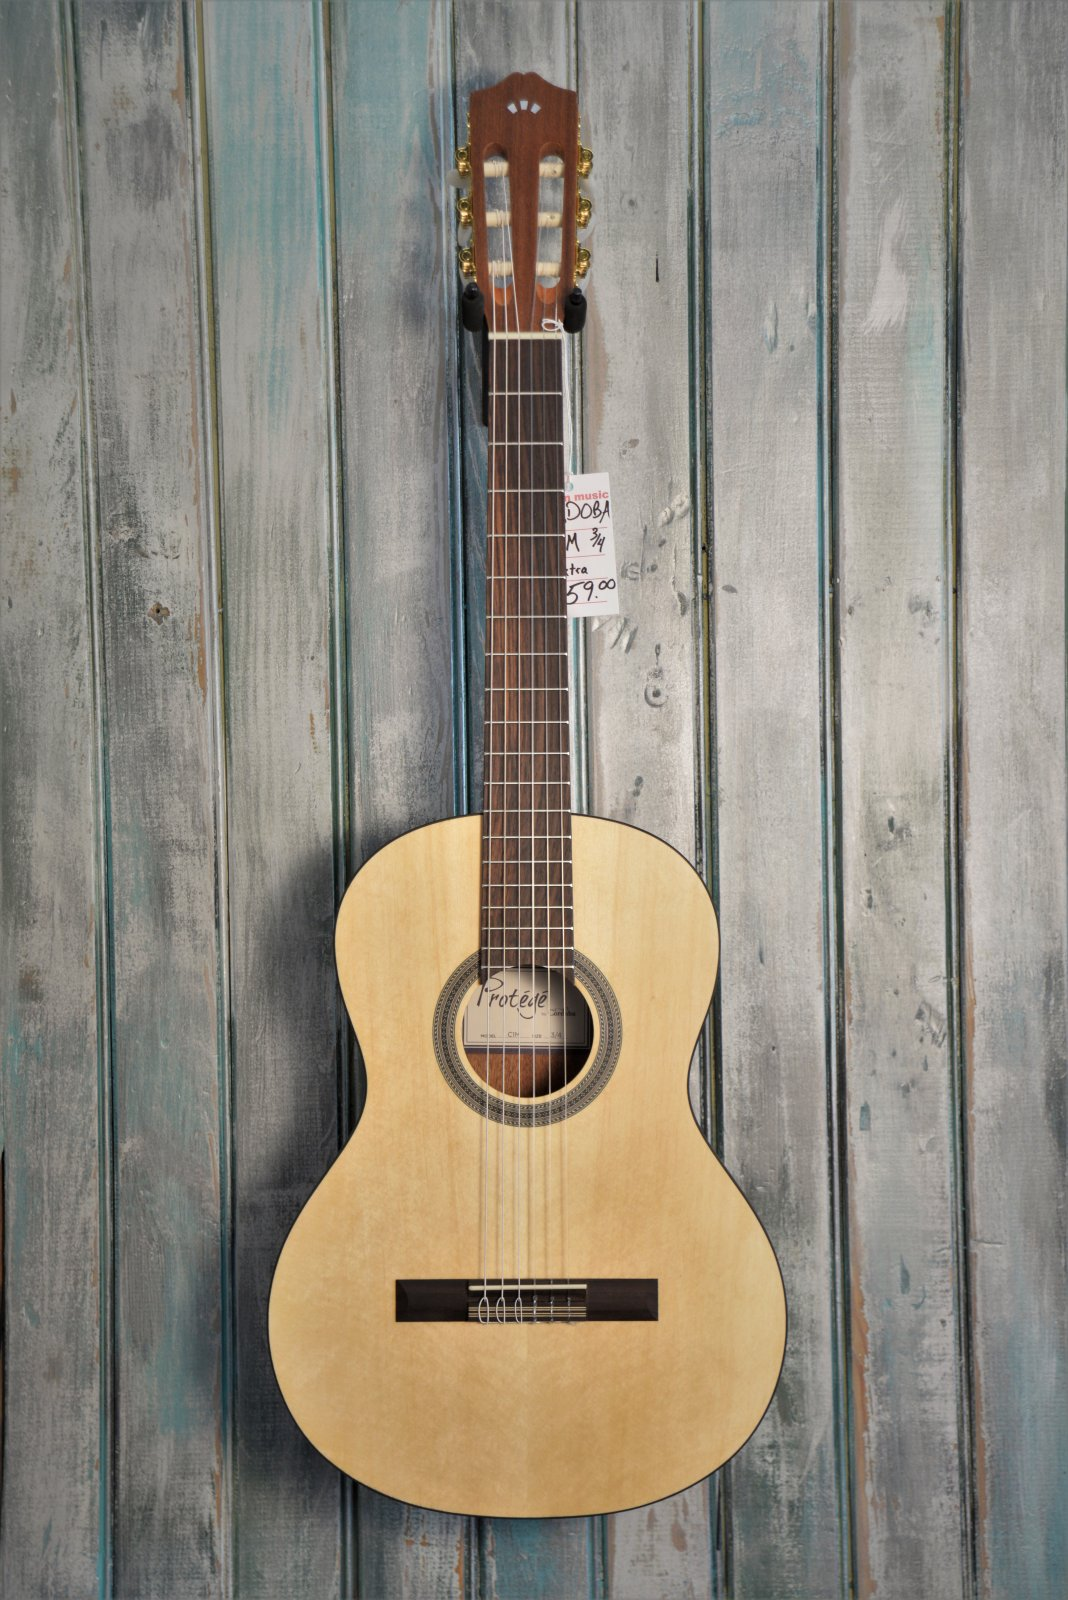 Protégé by Cordoba C1M Classical Guitar